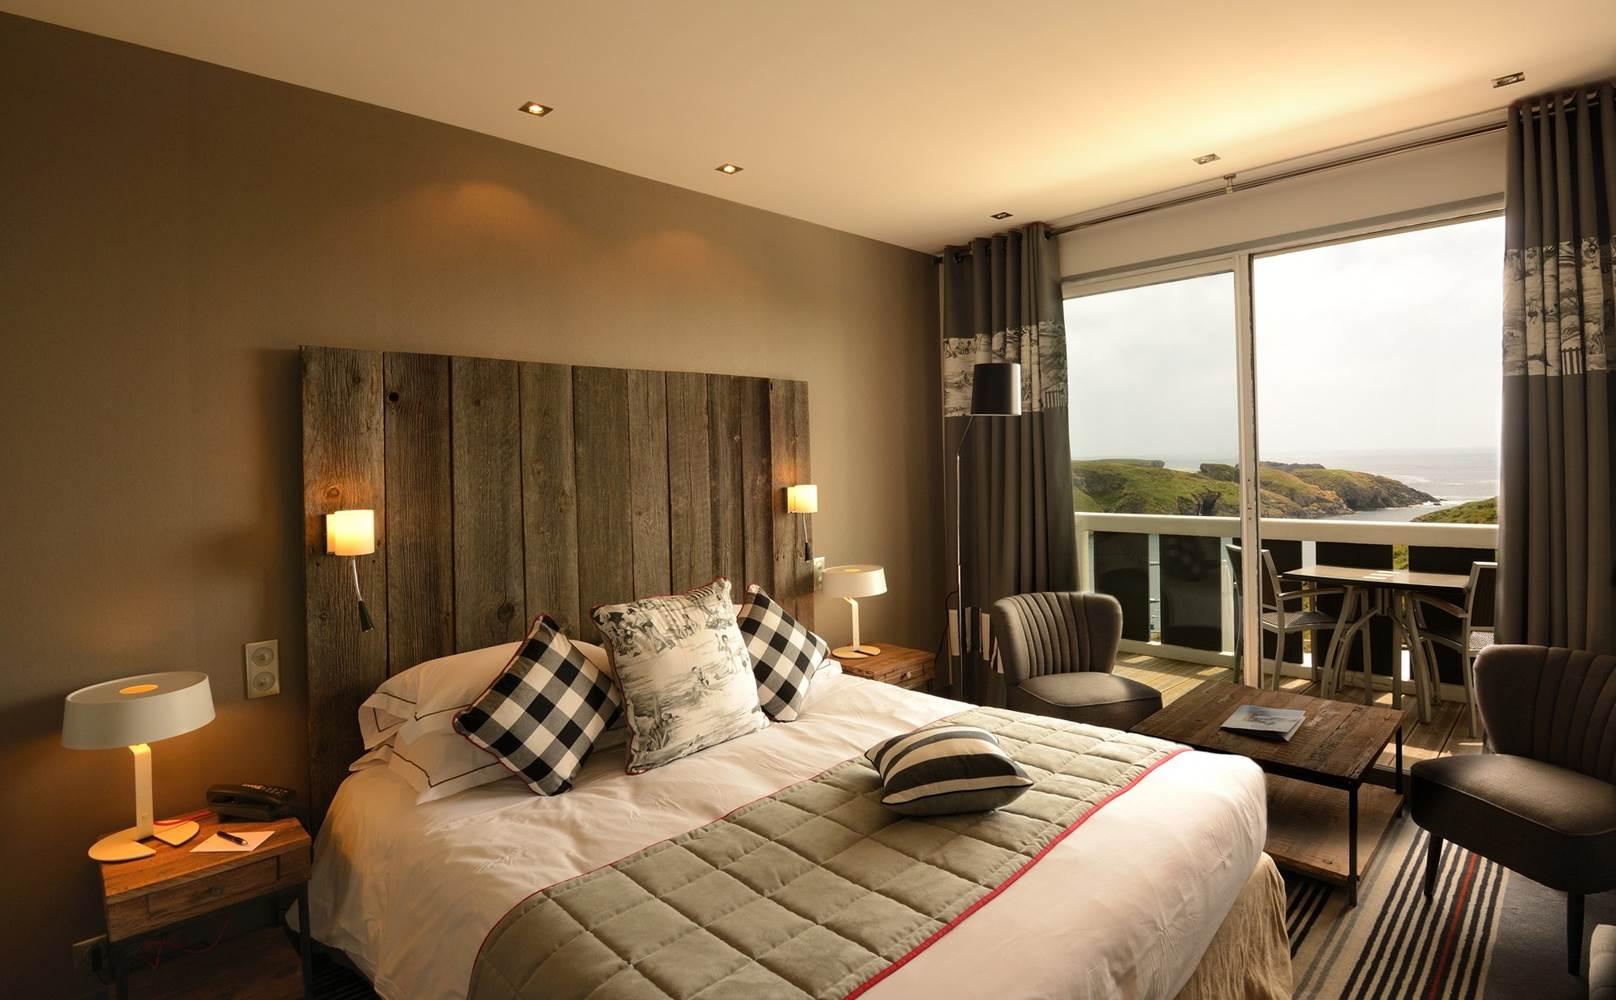 Hotel Castel clara - chambre vue mer 2 - belle ile en mer - morbihan bretagne sud ©